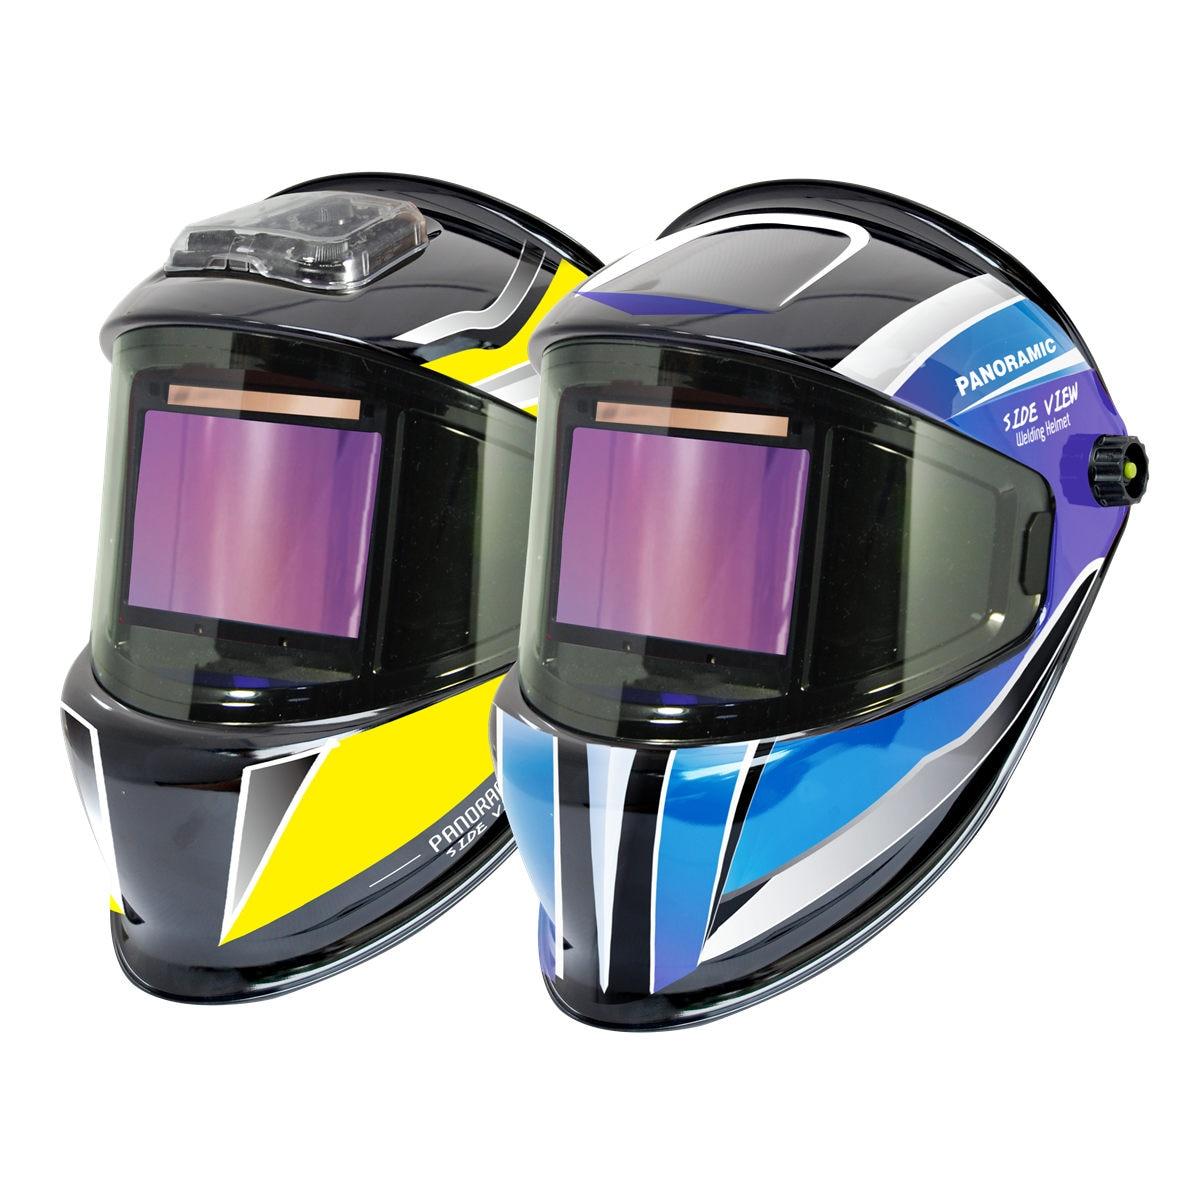 Welding Helmet 3 Side View DIN 5-9 9-13 Optical Rating 1111 4 Sensors True Color EN379 ANSI CSA Auto Darkening Welding Mask